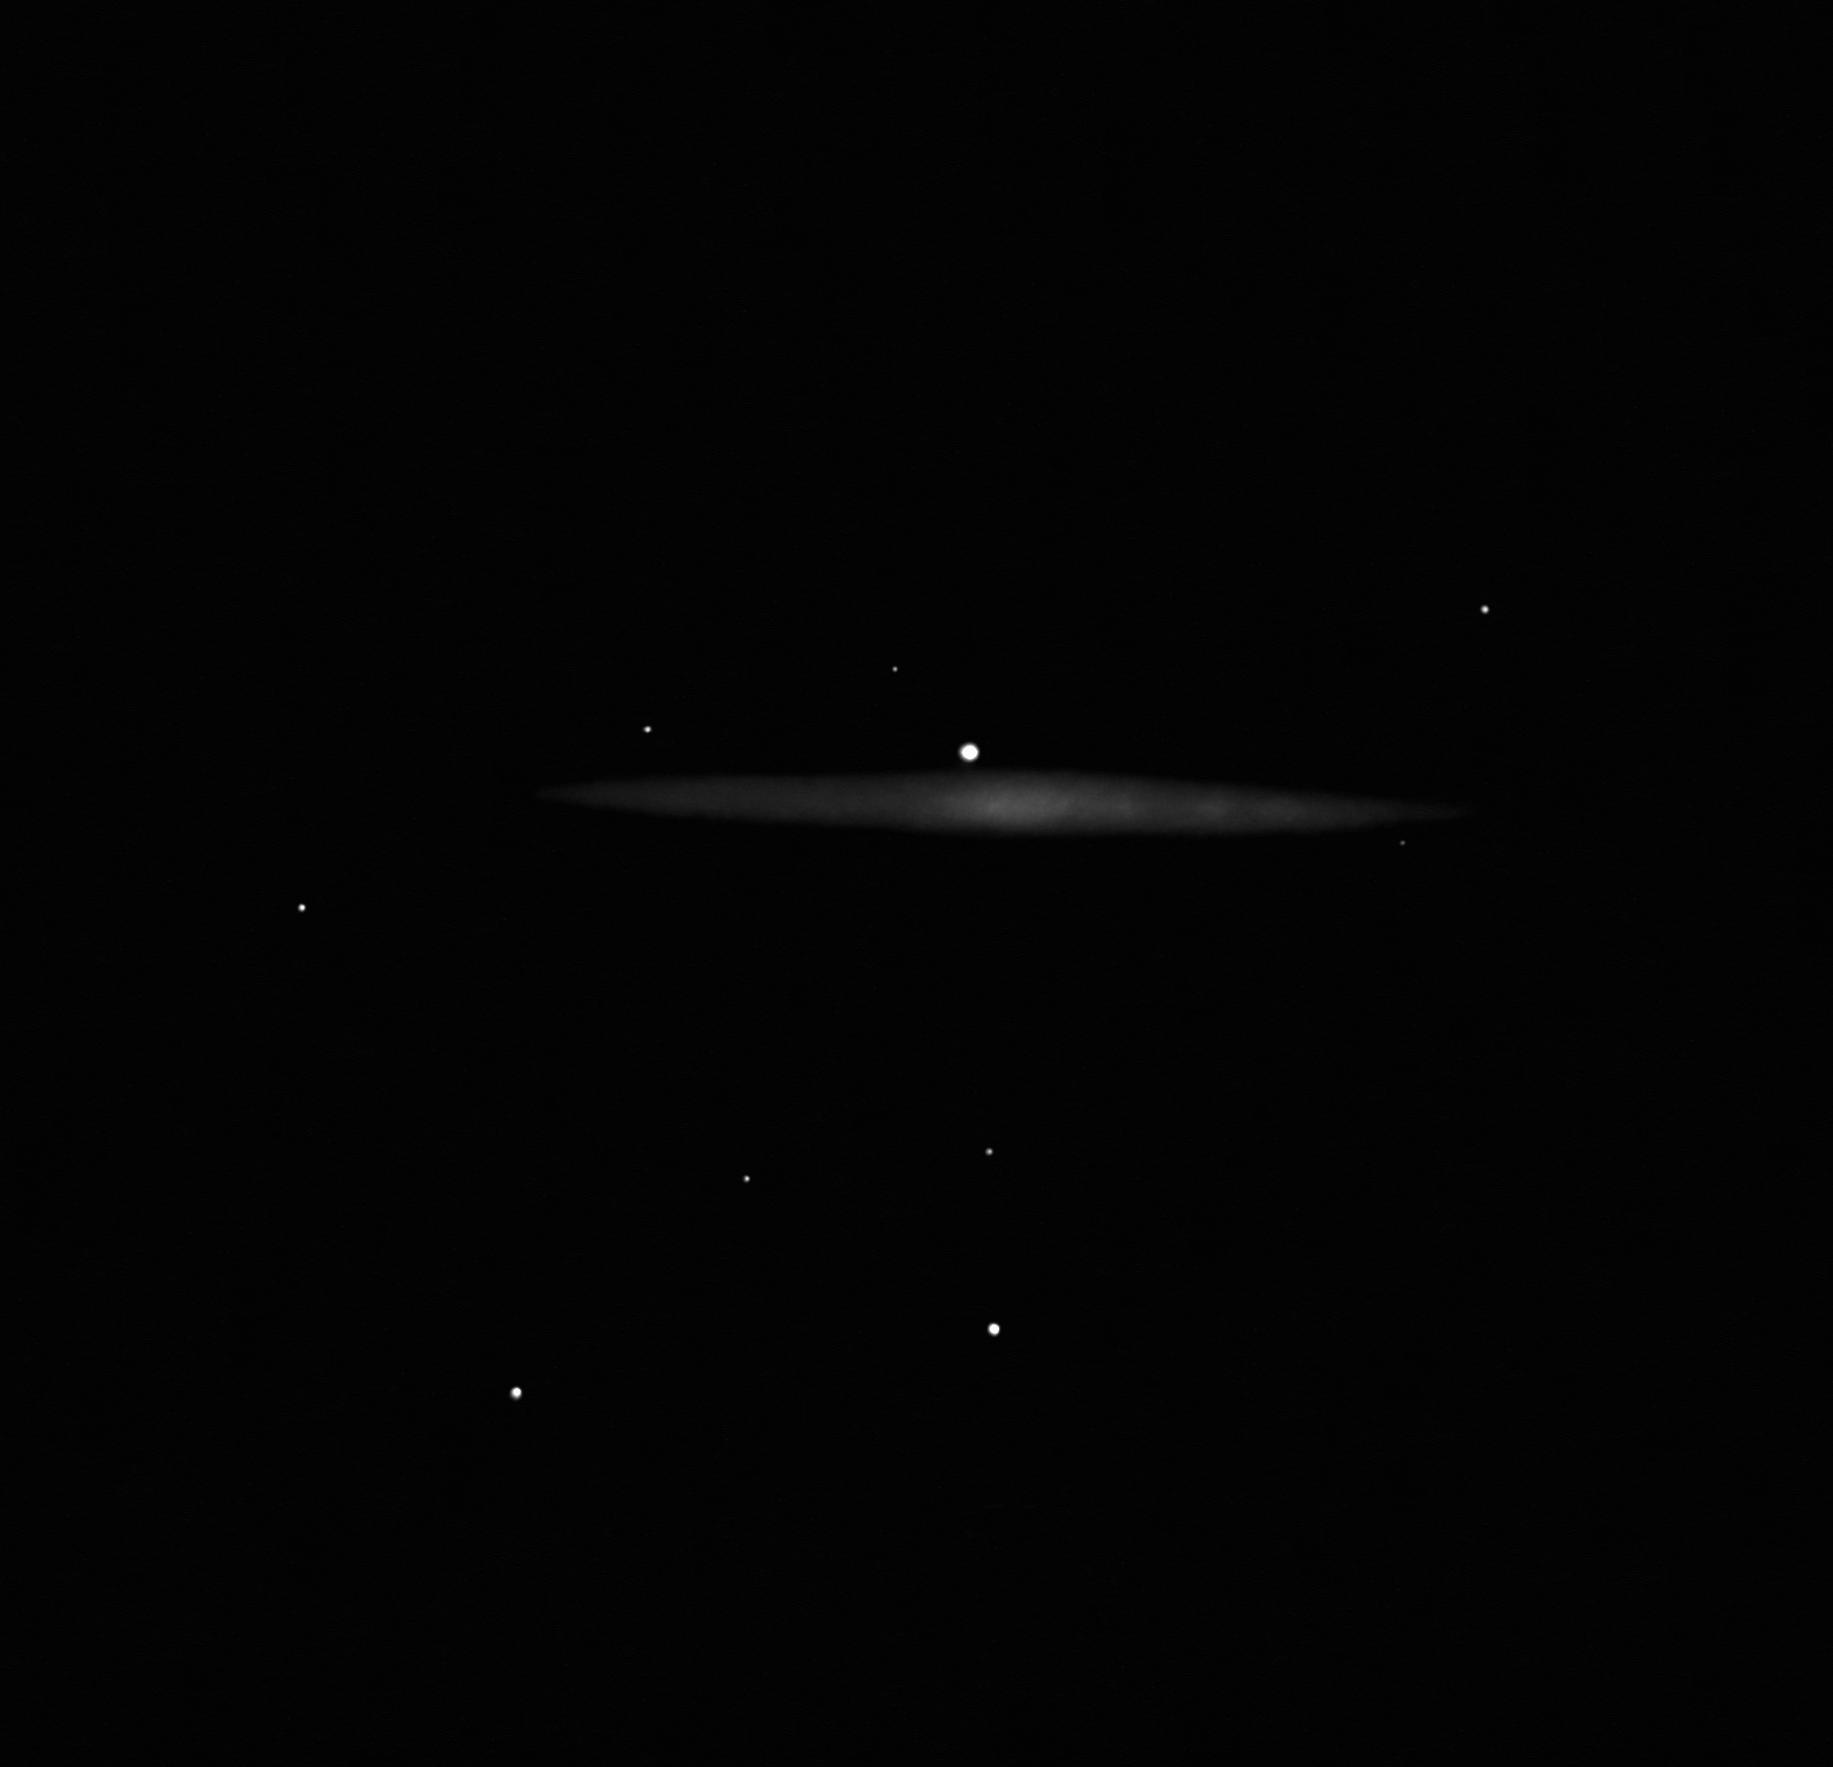 ngc 4517 galaxy